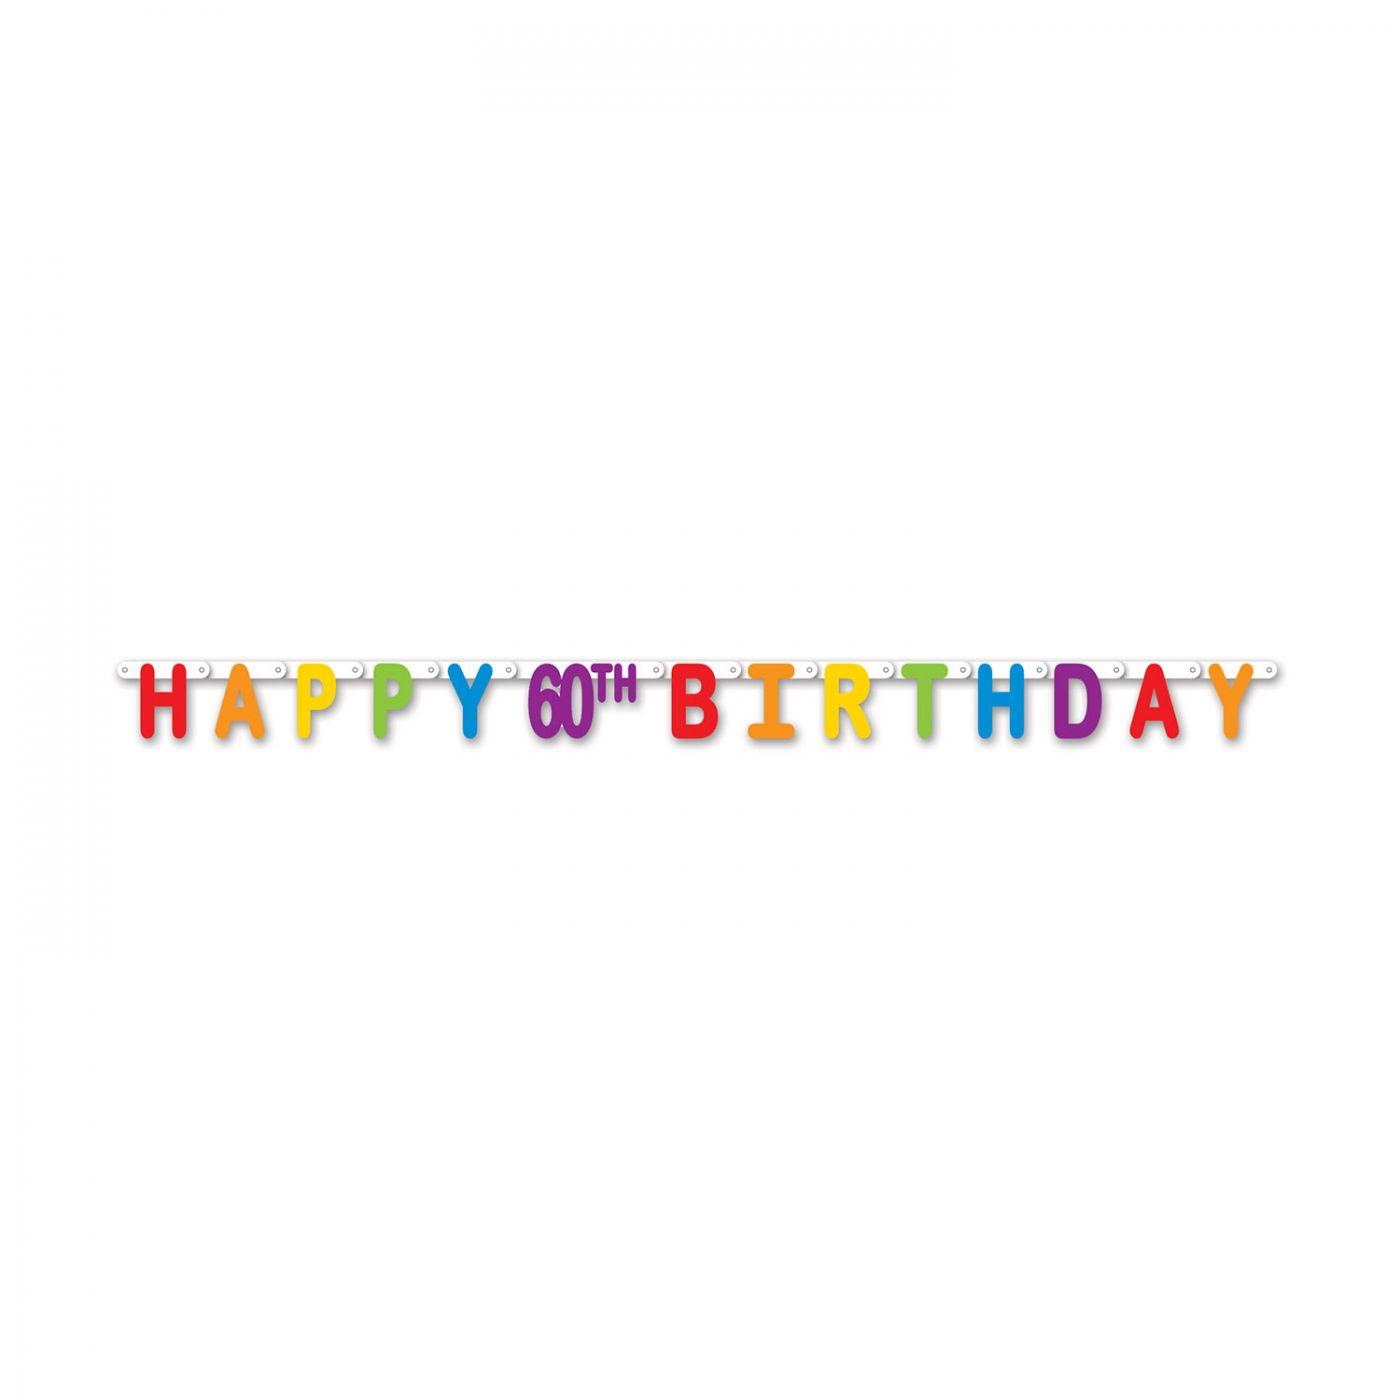 Happy 60th Birthday Streamer image